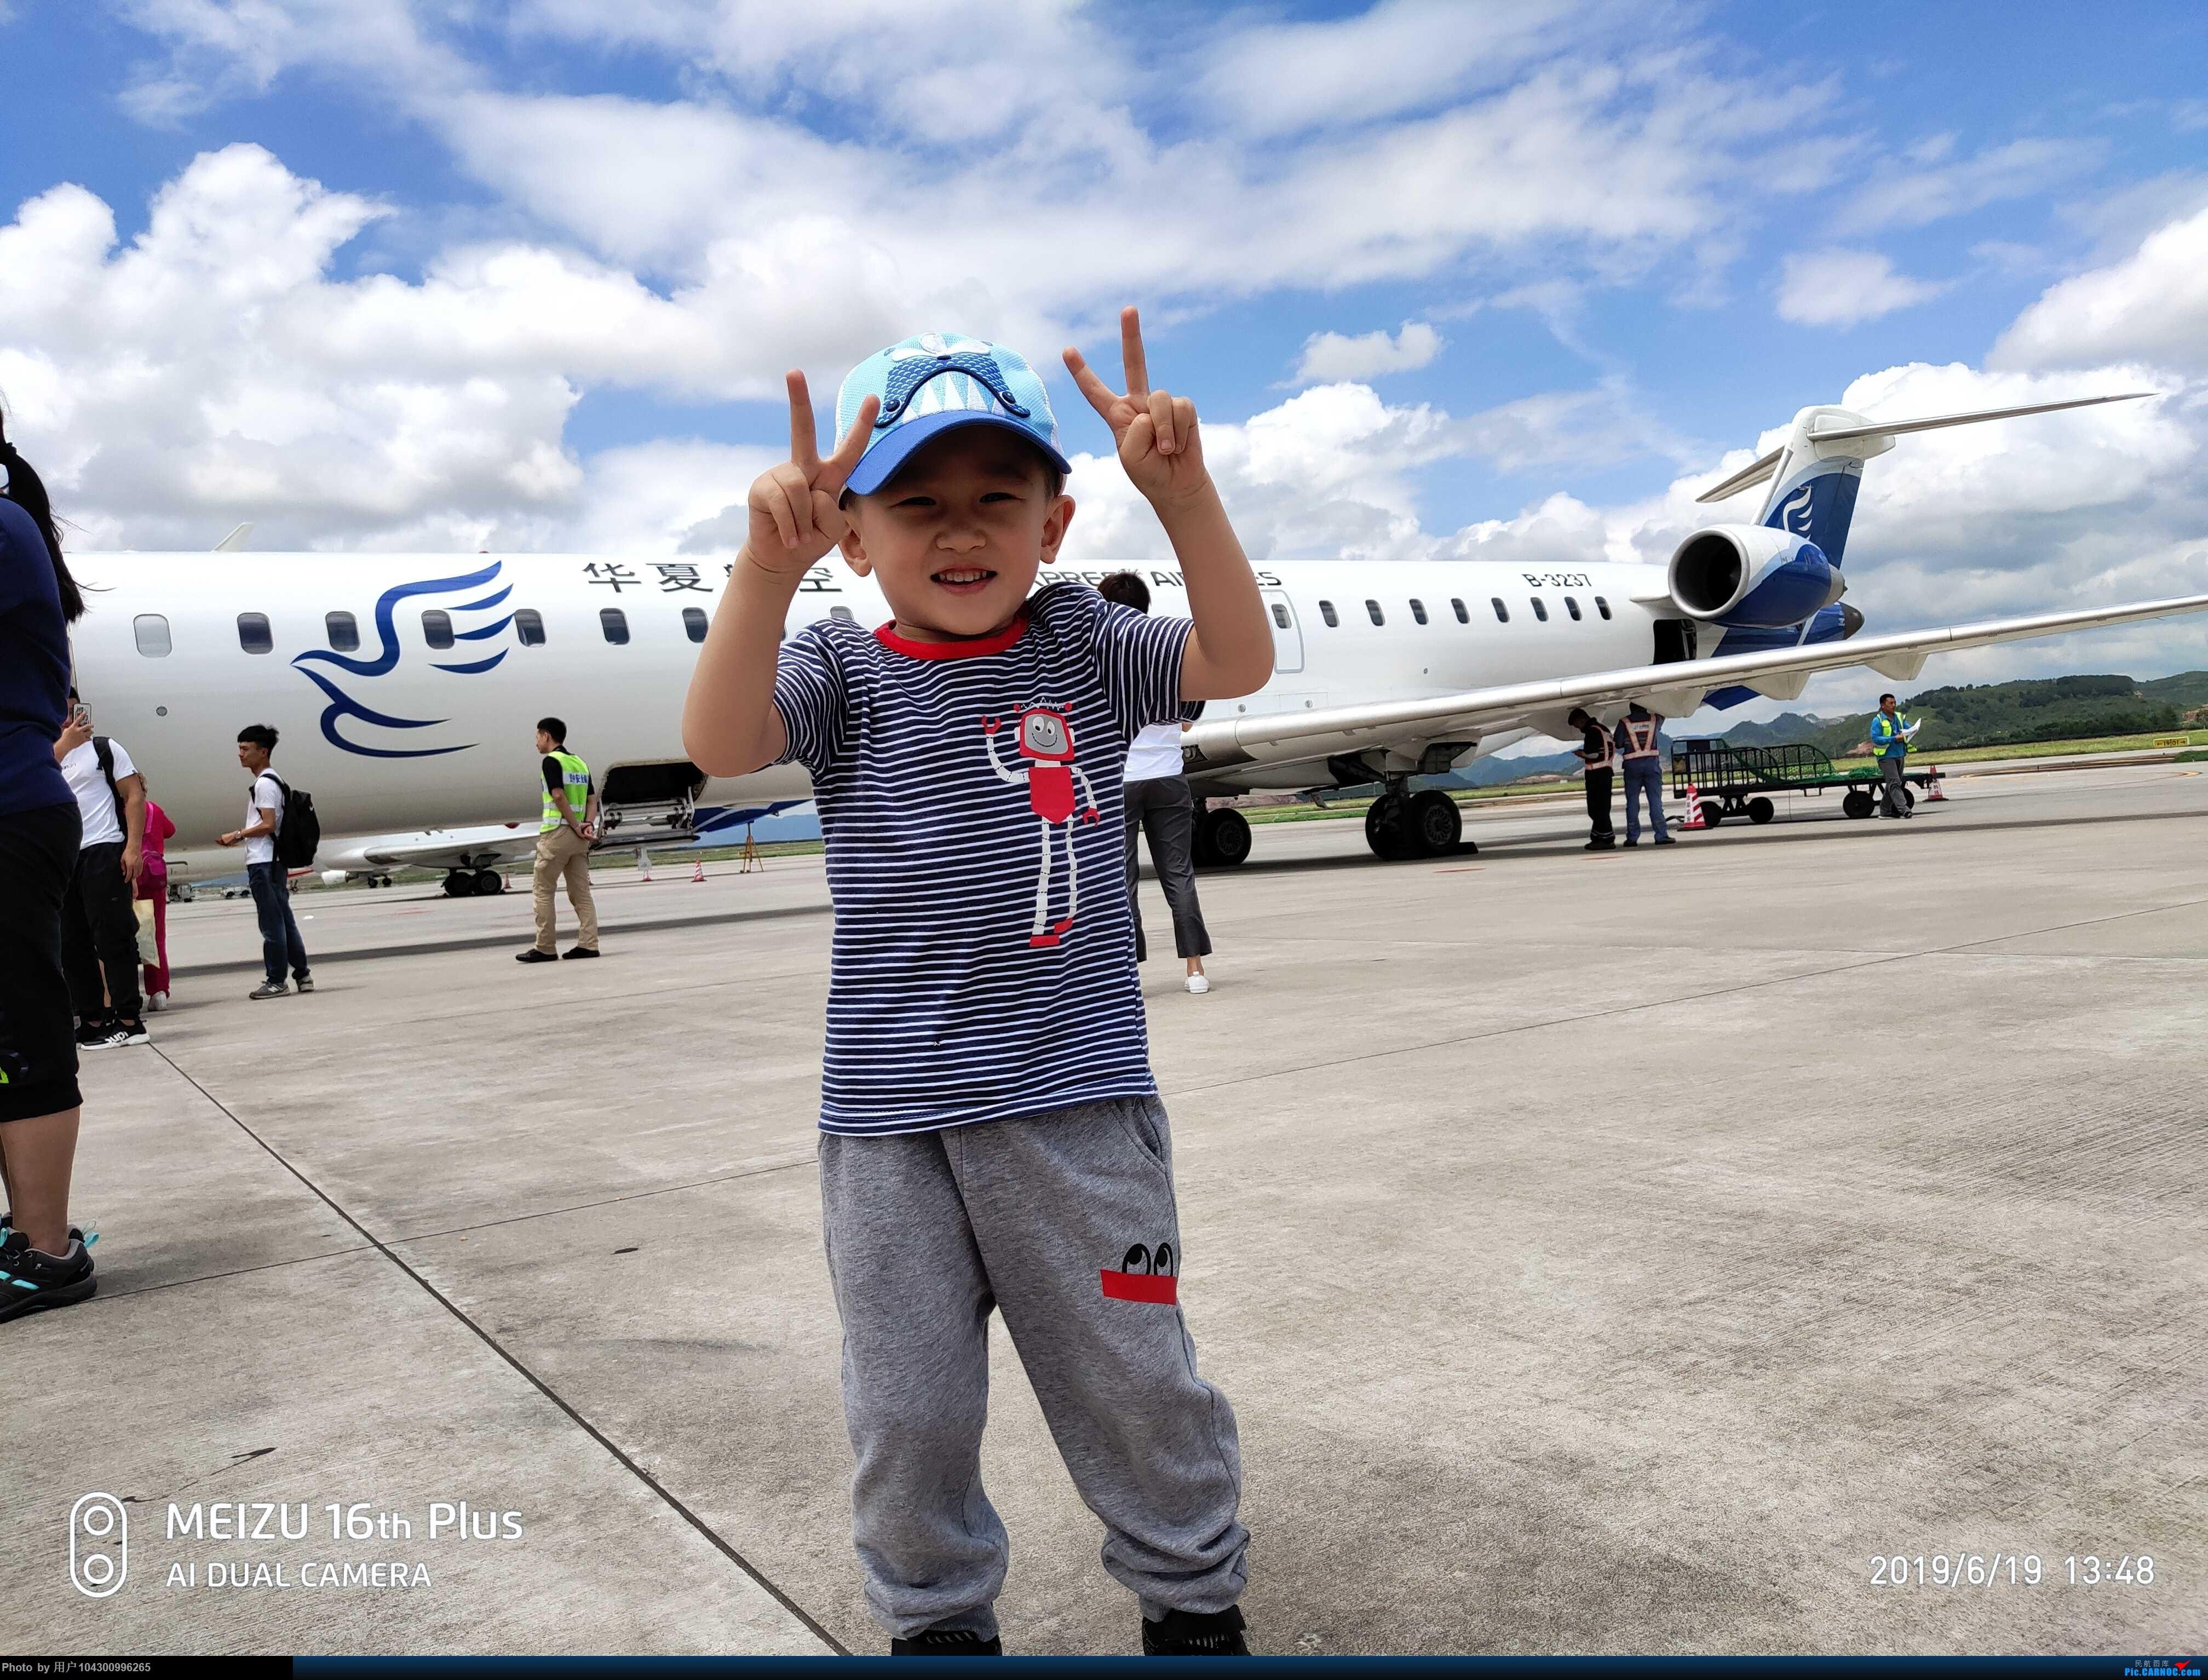 Re:[原创]DM哥飞行游记--贵阳往返荔波2日游 BOMBARDIER CRJ900NG B-3237 中国贵阳龙洞堡国际机场